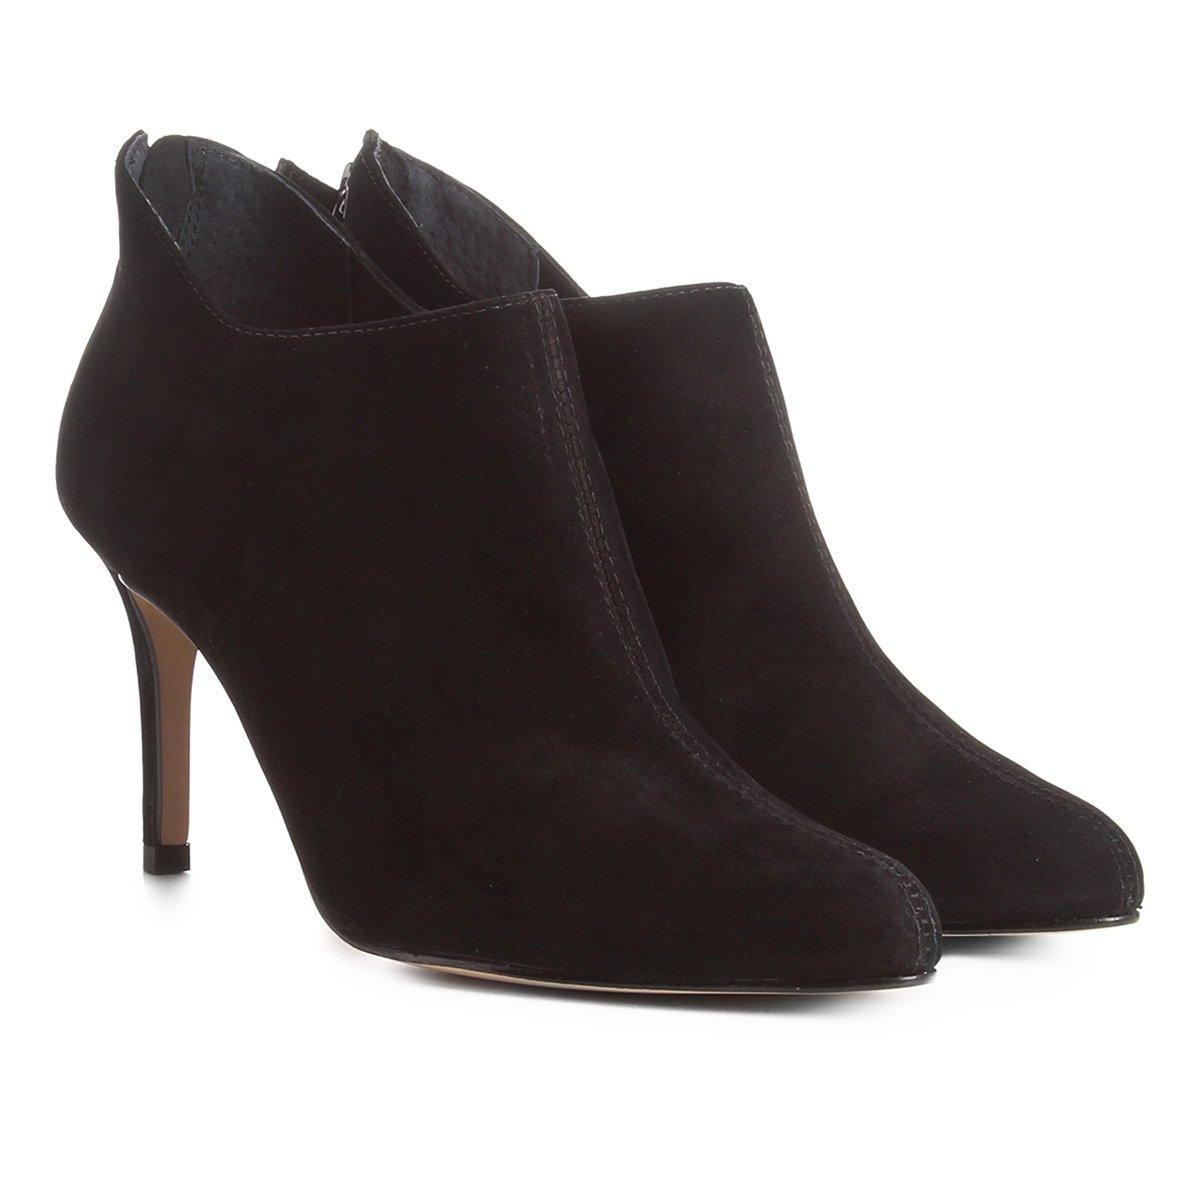 dfc4c845b2 Bota Couro Cano Curto Shoestock Ondas Salto Alto Feminina - Preto |  Shoestock